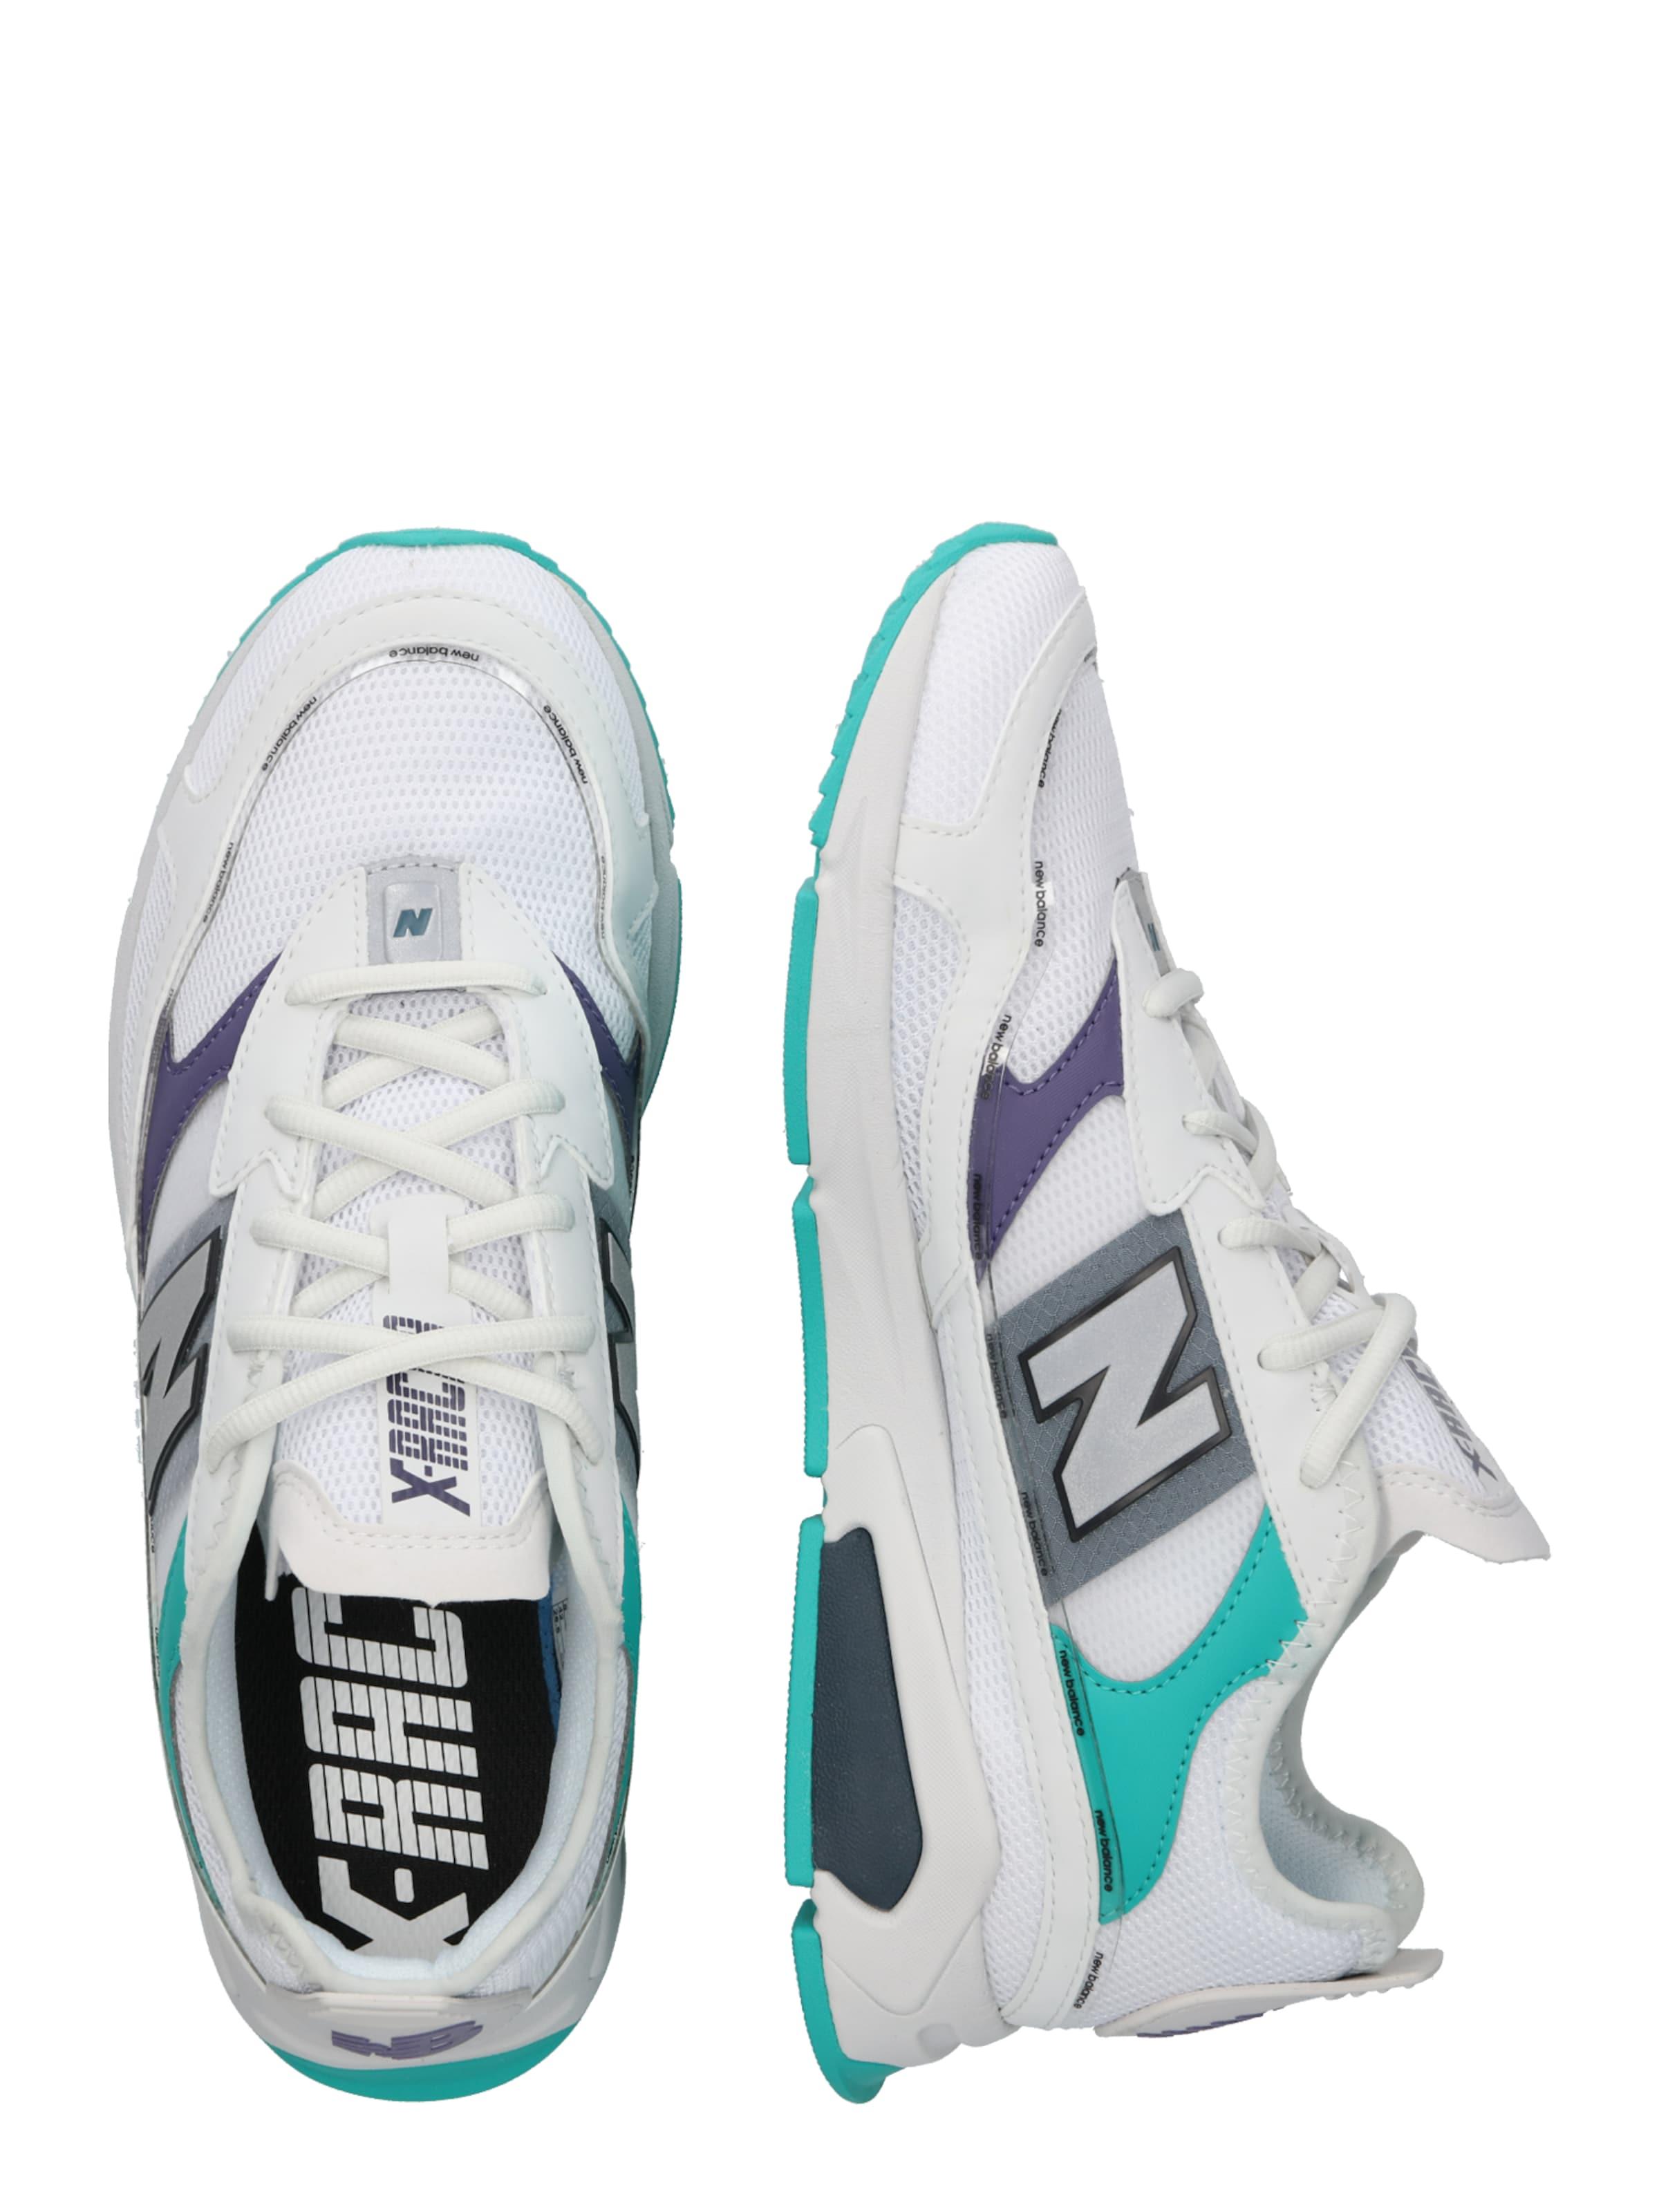 'msxrchl' Sneaker TürkisLila Balance New Weiß In qSVGpzUM